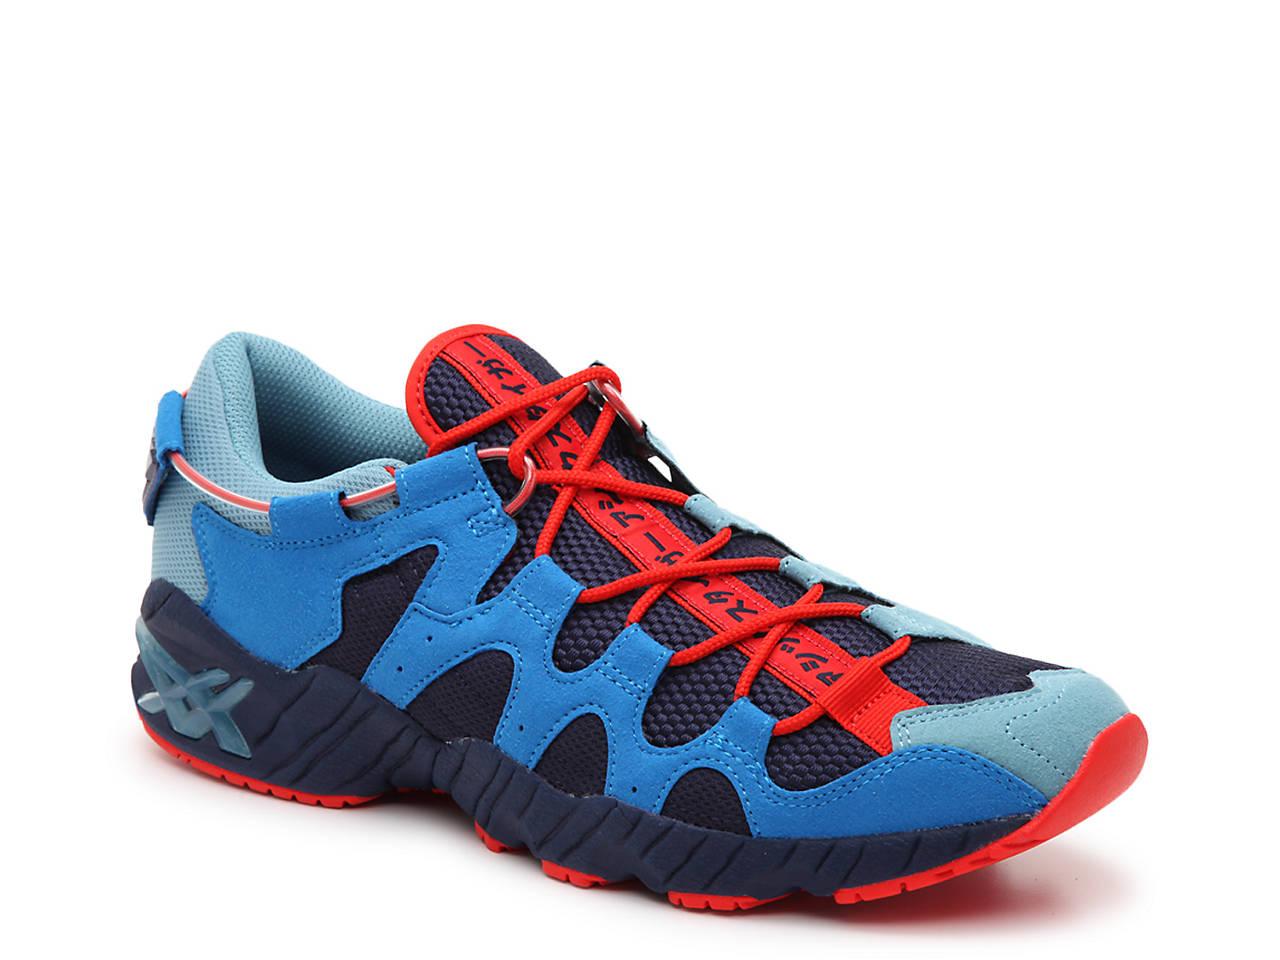 new product b7501 4bcbb GEL-Mai Sneaker - Men's